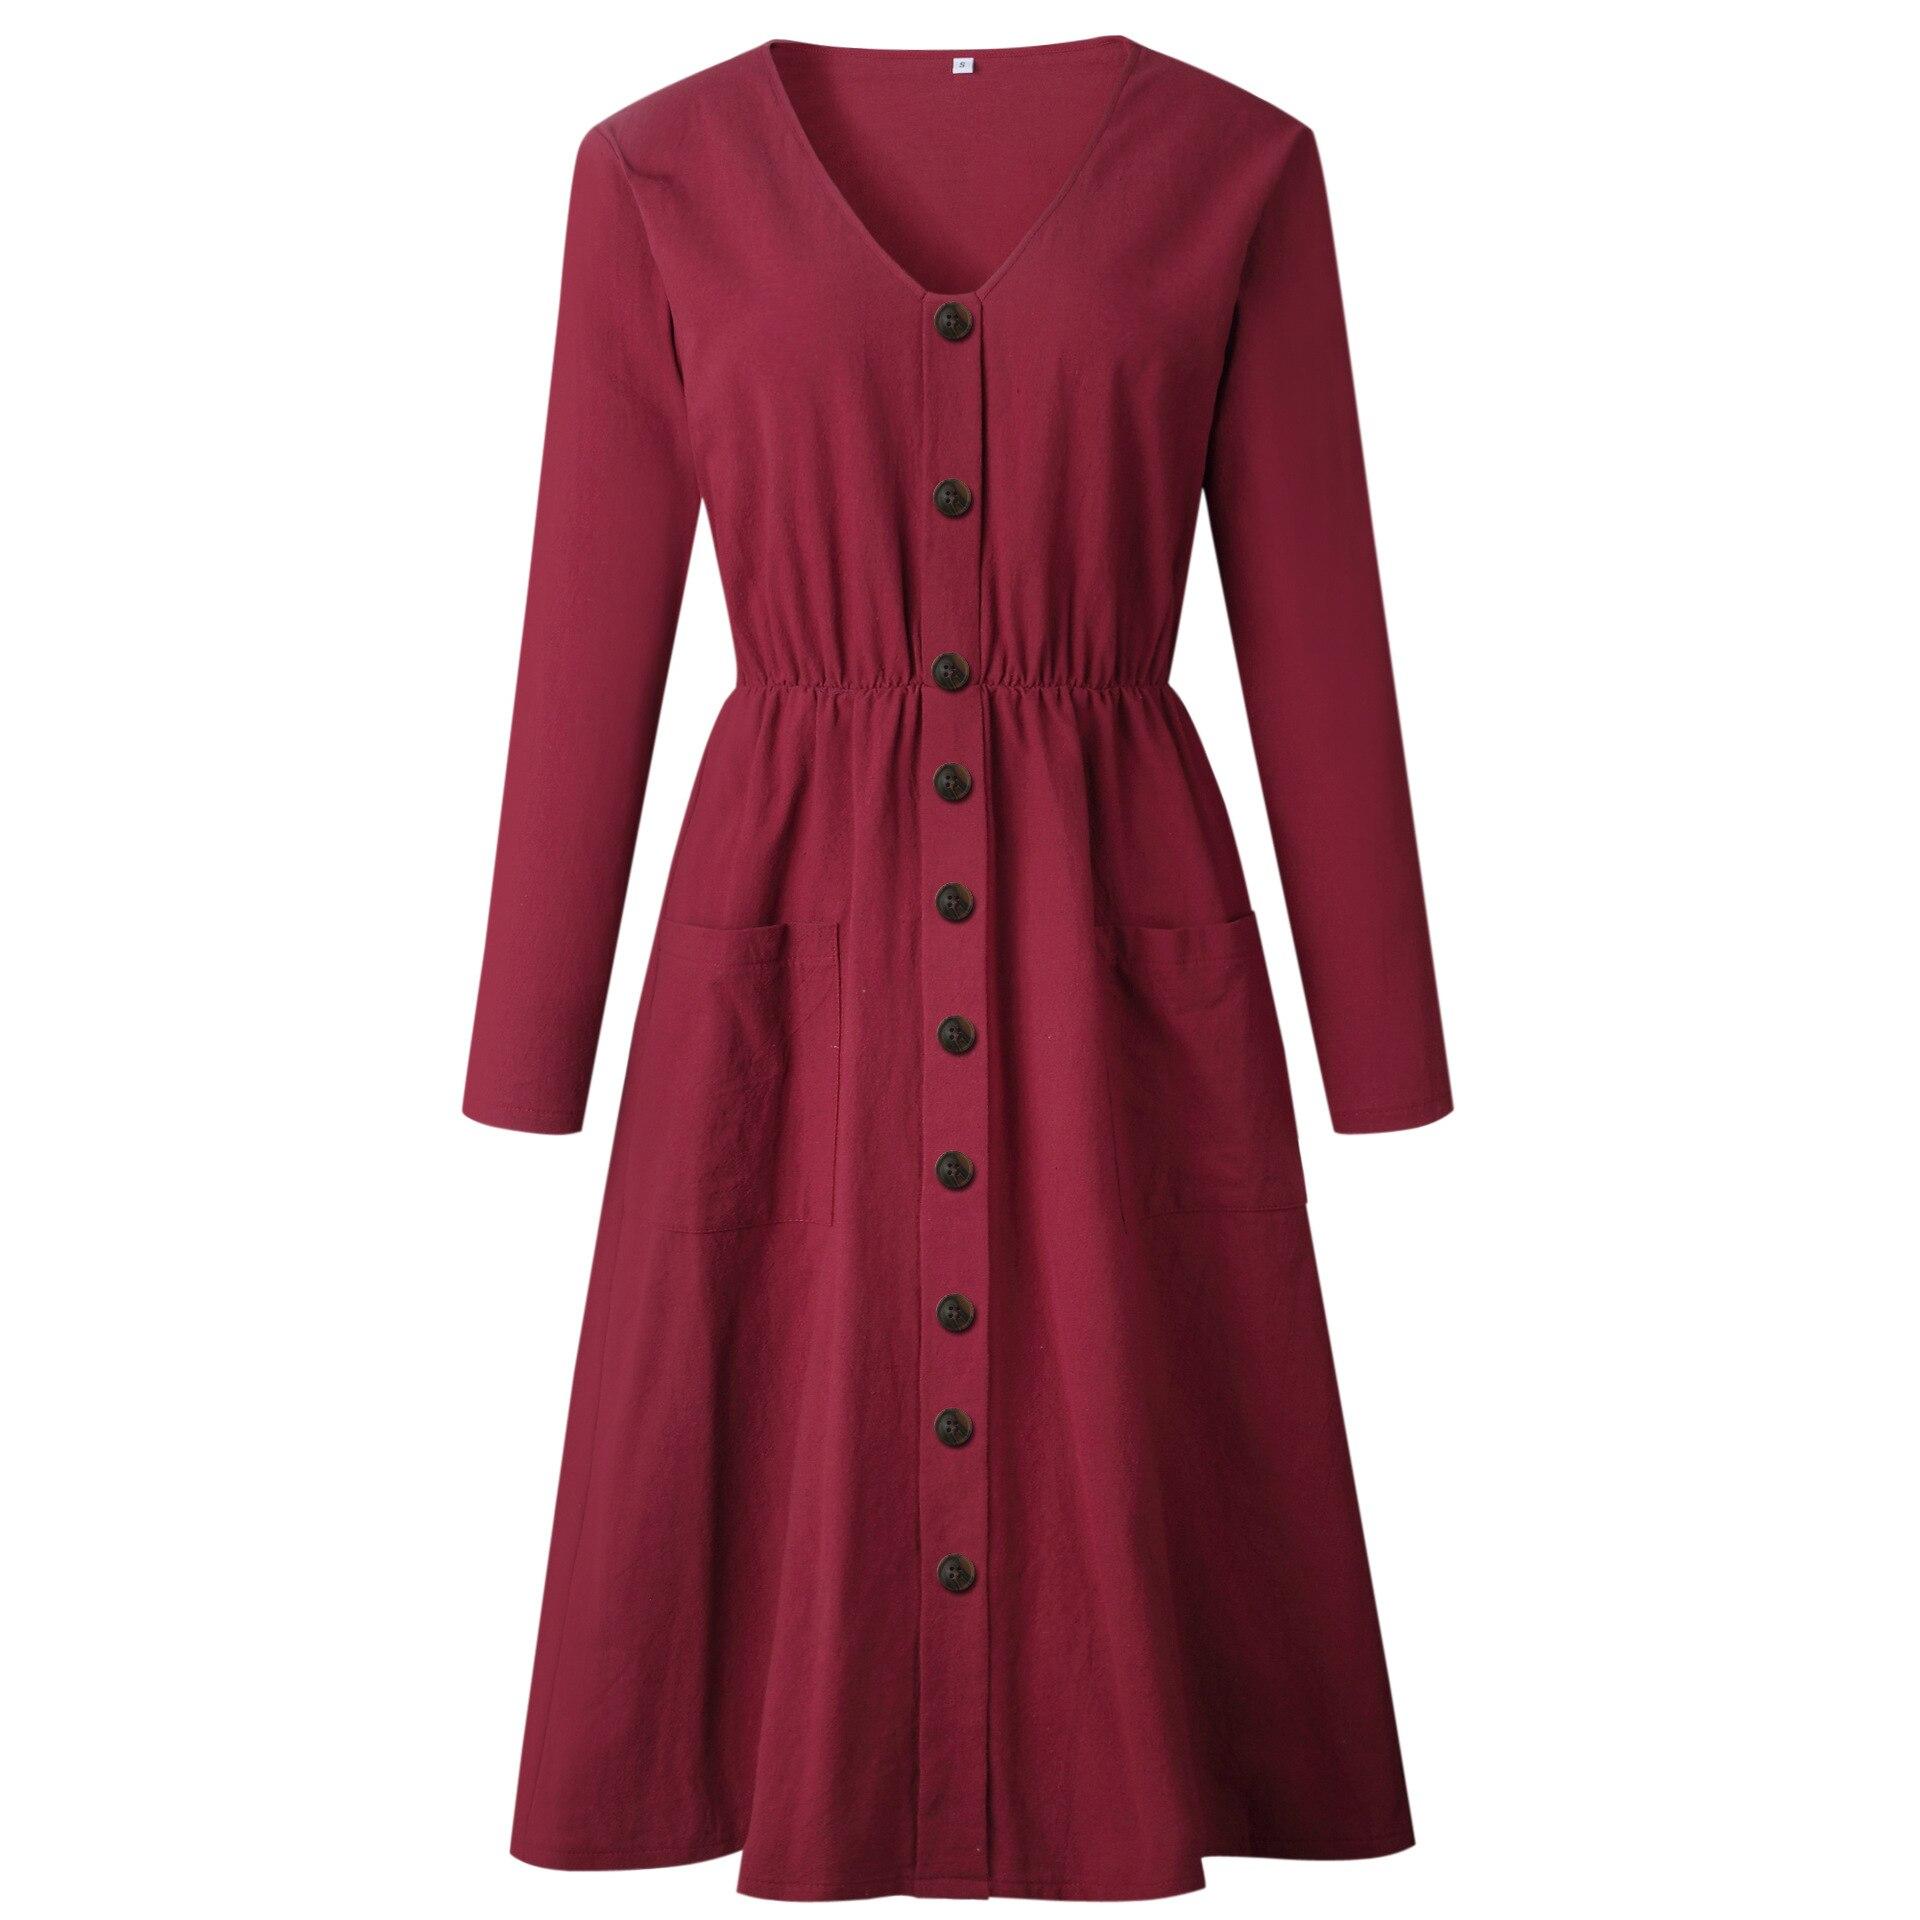 Red Blue A Line Casual Dresses Women Autumn Dress 19 Vintage Long Sleeve Dress For Ladies Buttons V Neck Midi Vestidos Female 26